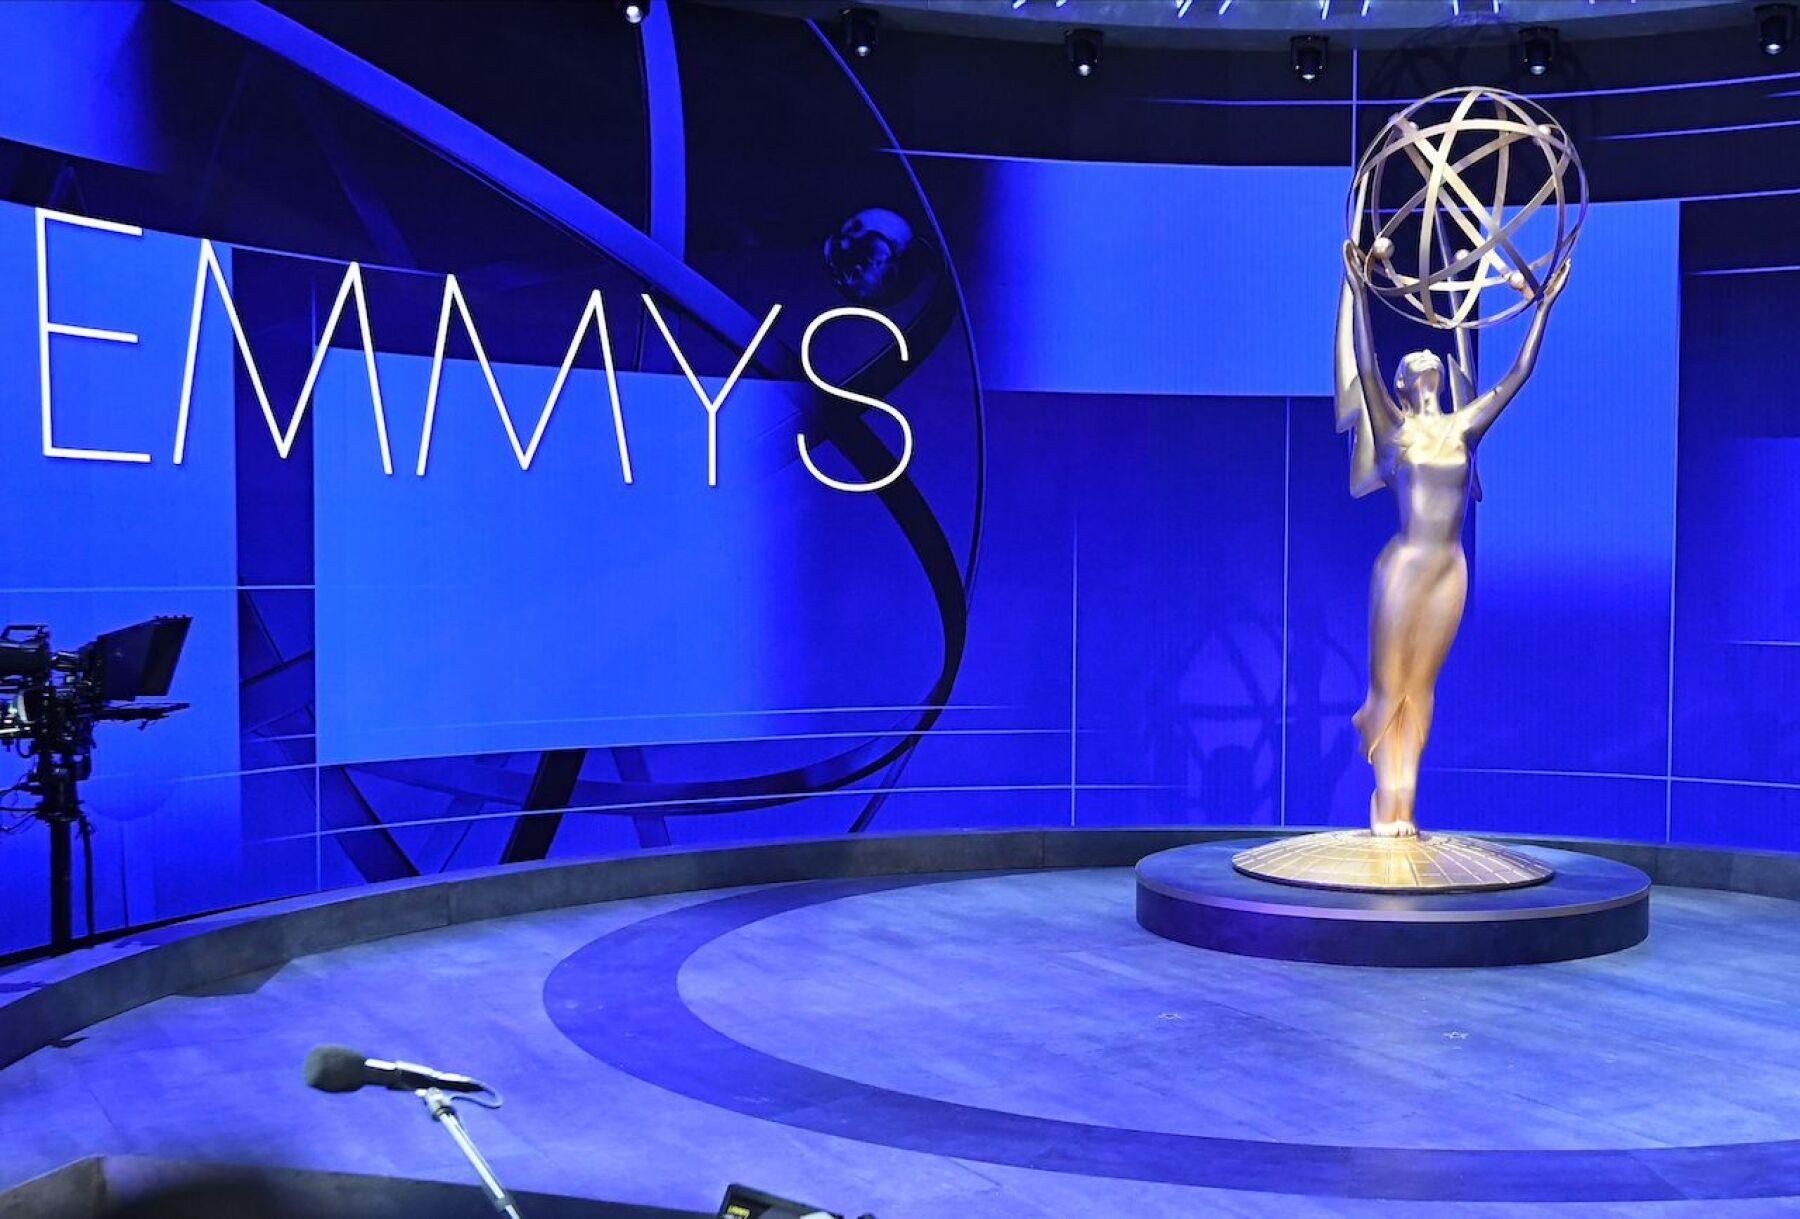 72nd Annual Primetime Emmy Awards, Staples Center, Los Angeles, USA - 20 Sep 2020